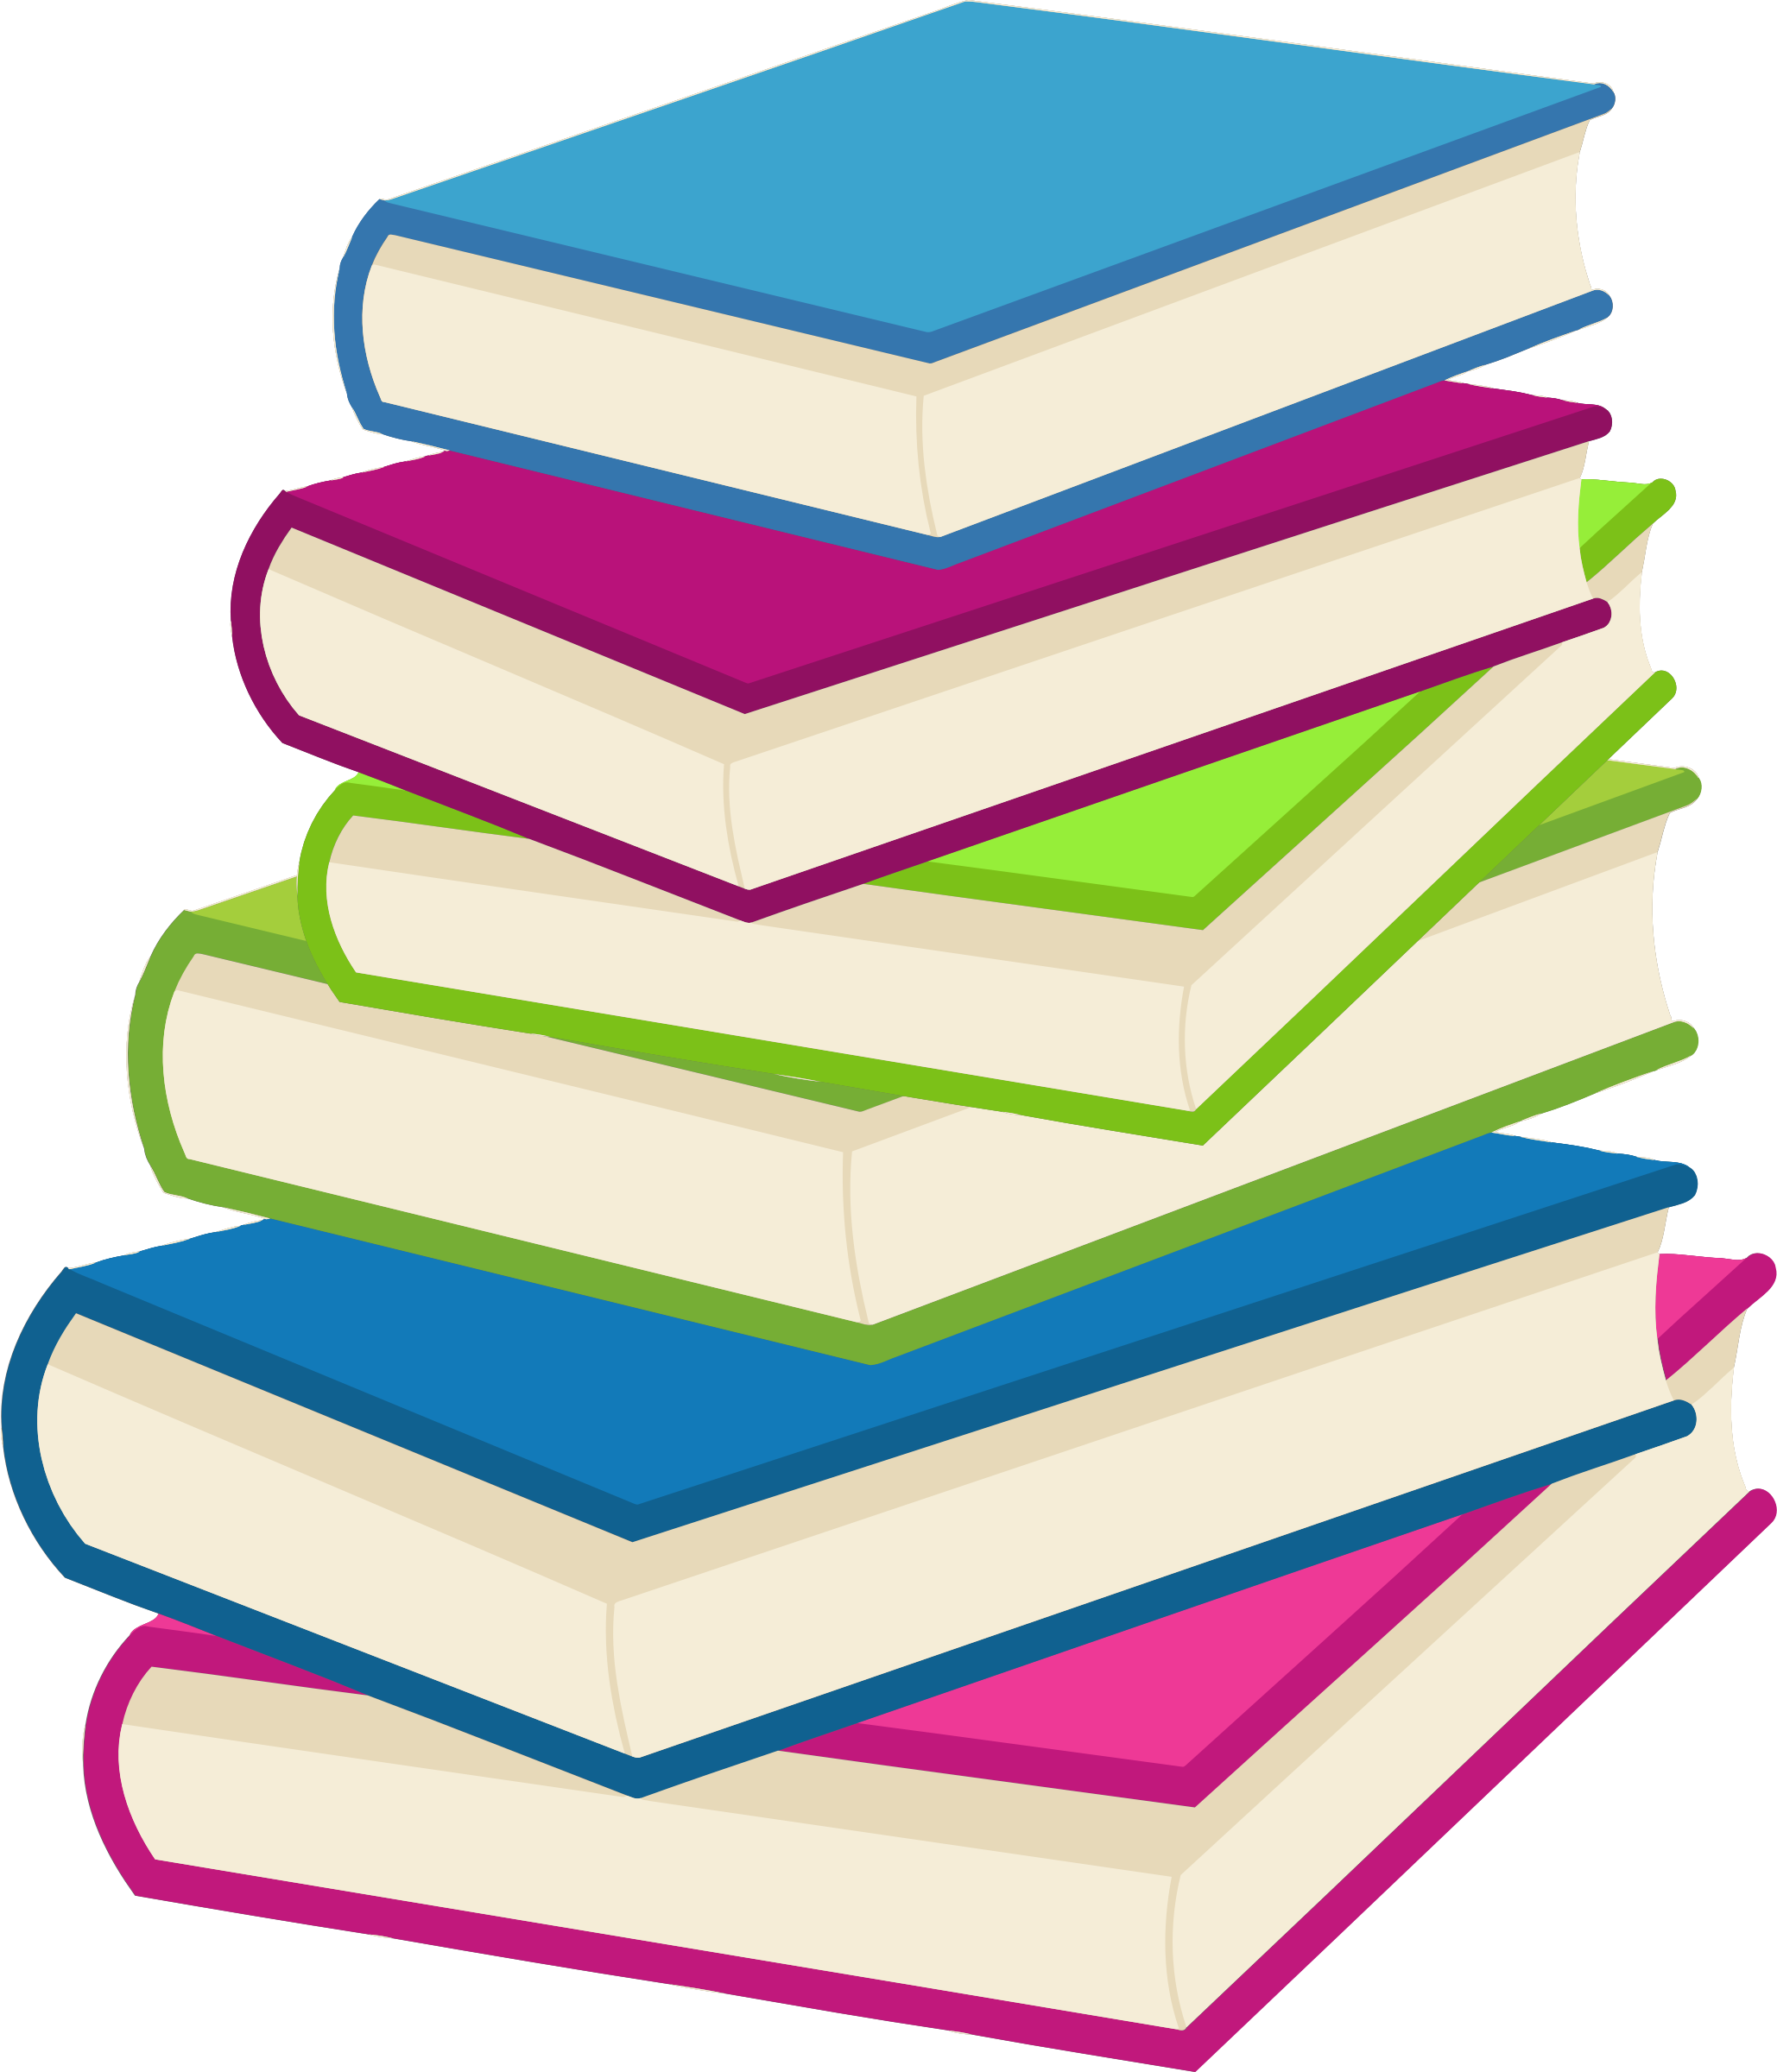 Book Sea of Memories Library Clip art.